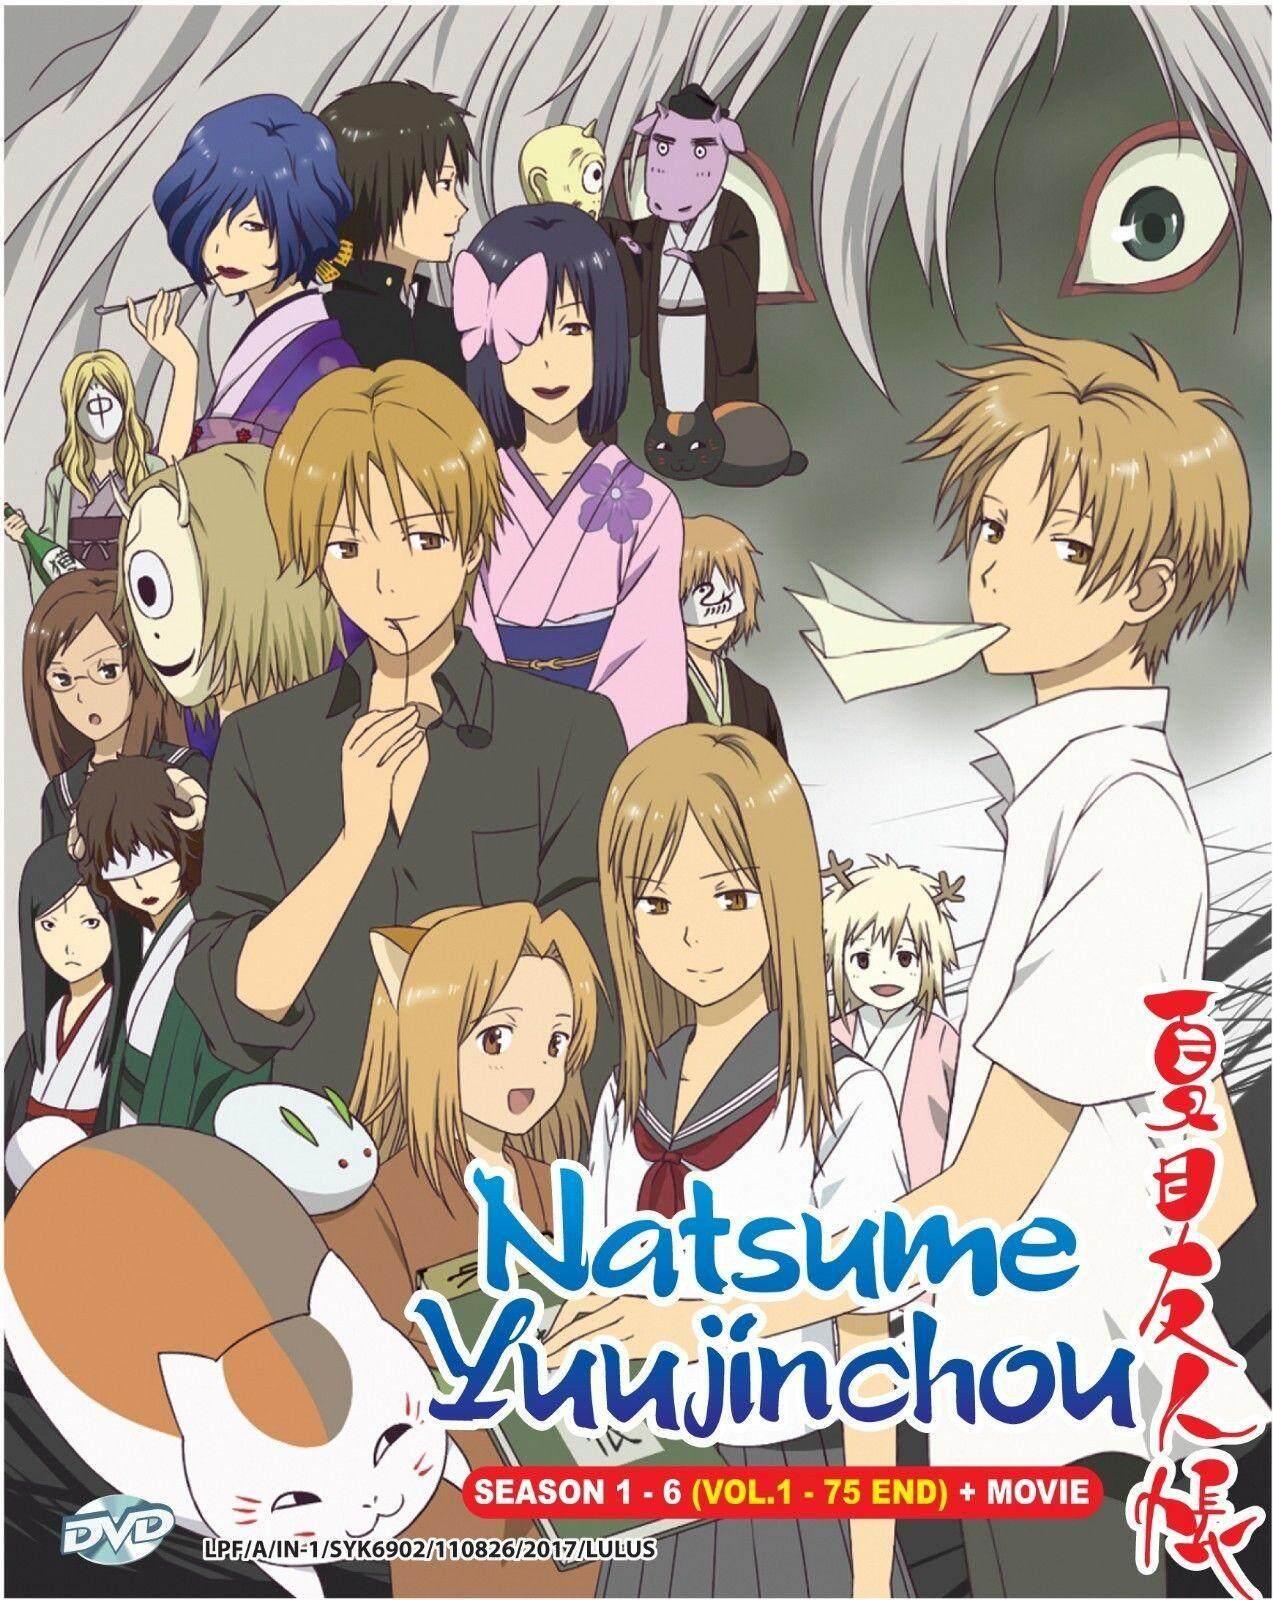 Anime Dvd Natsume Yuujinchou Season 1-6 Vol.1-75 End + Movie By Onekm Animation Shop.